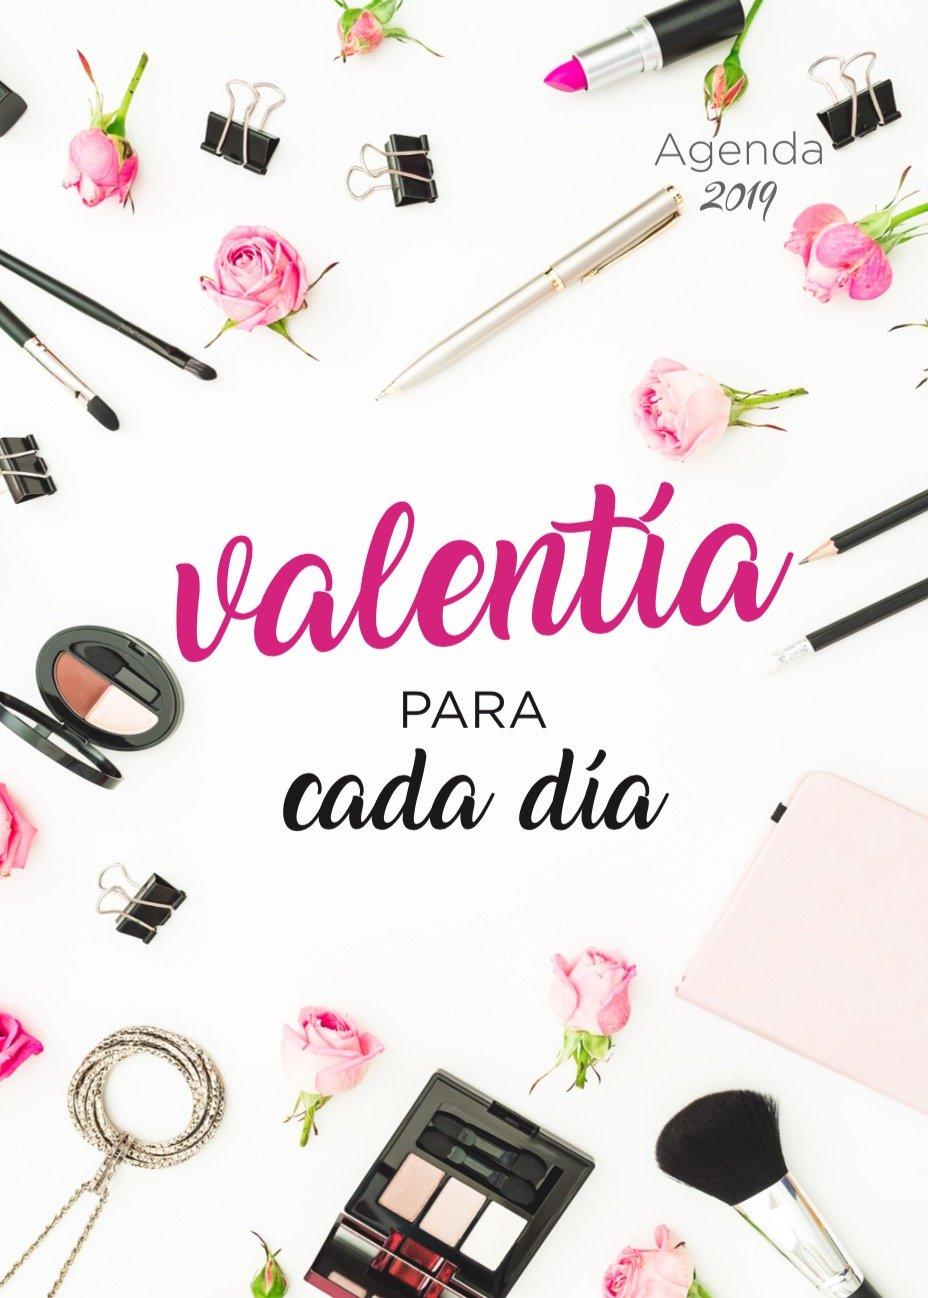 Agenda Valentia 2019 - Maquillaje (Spanish Edition): Pura ...